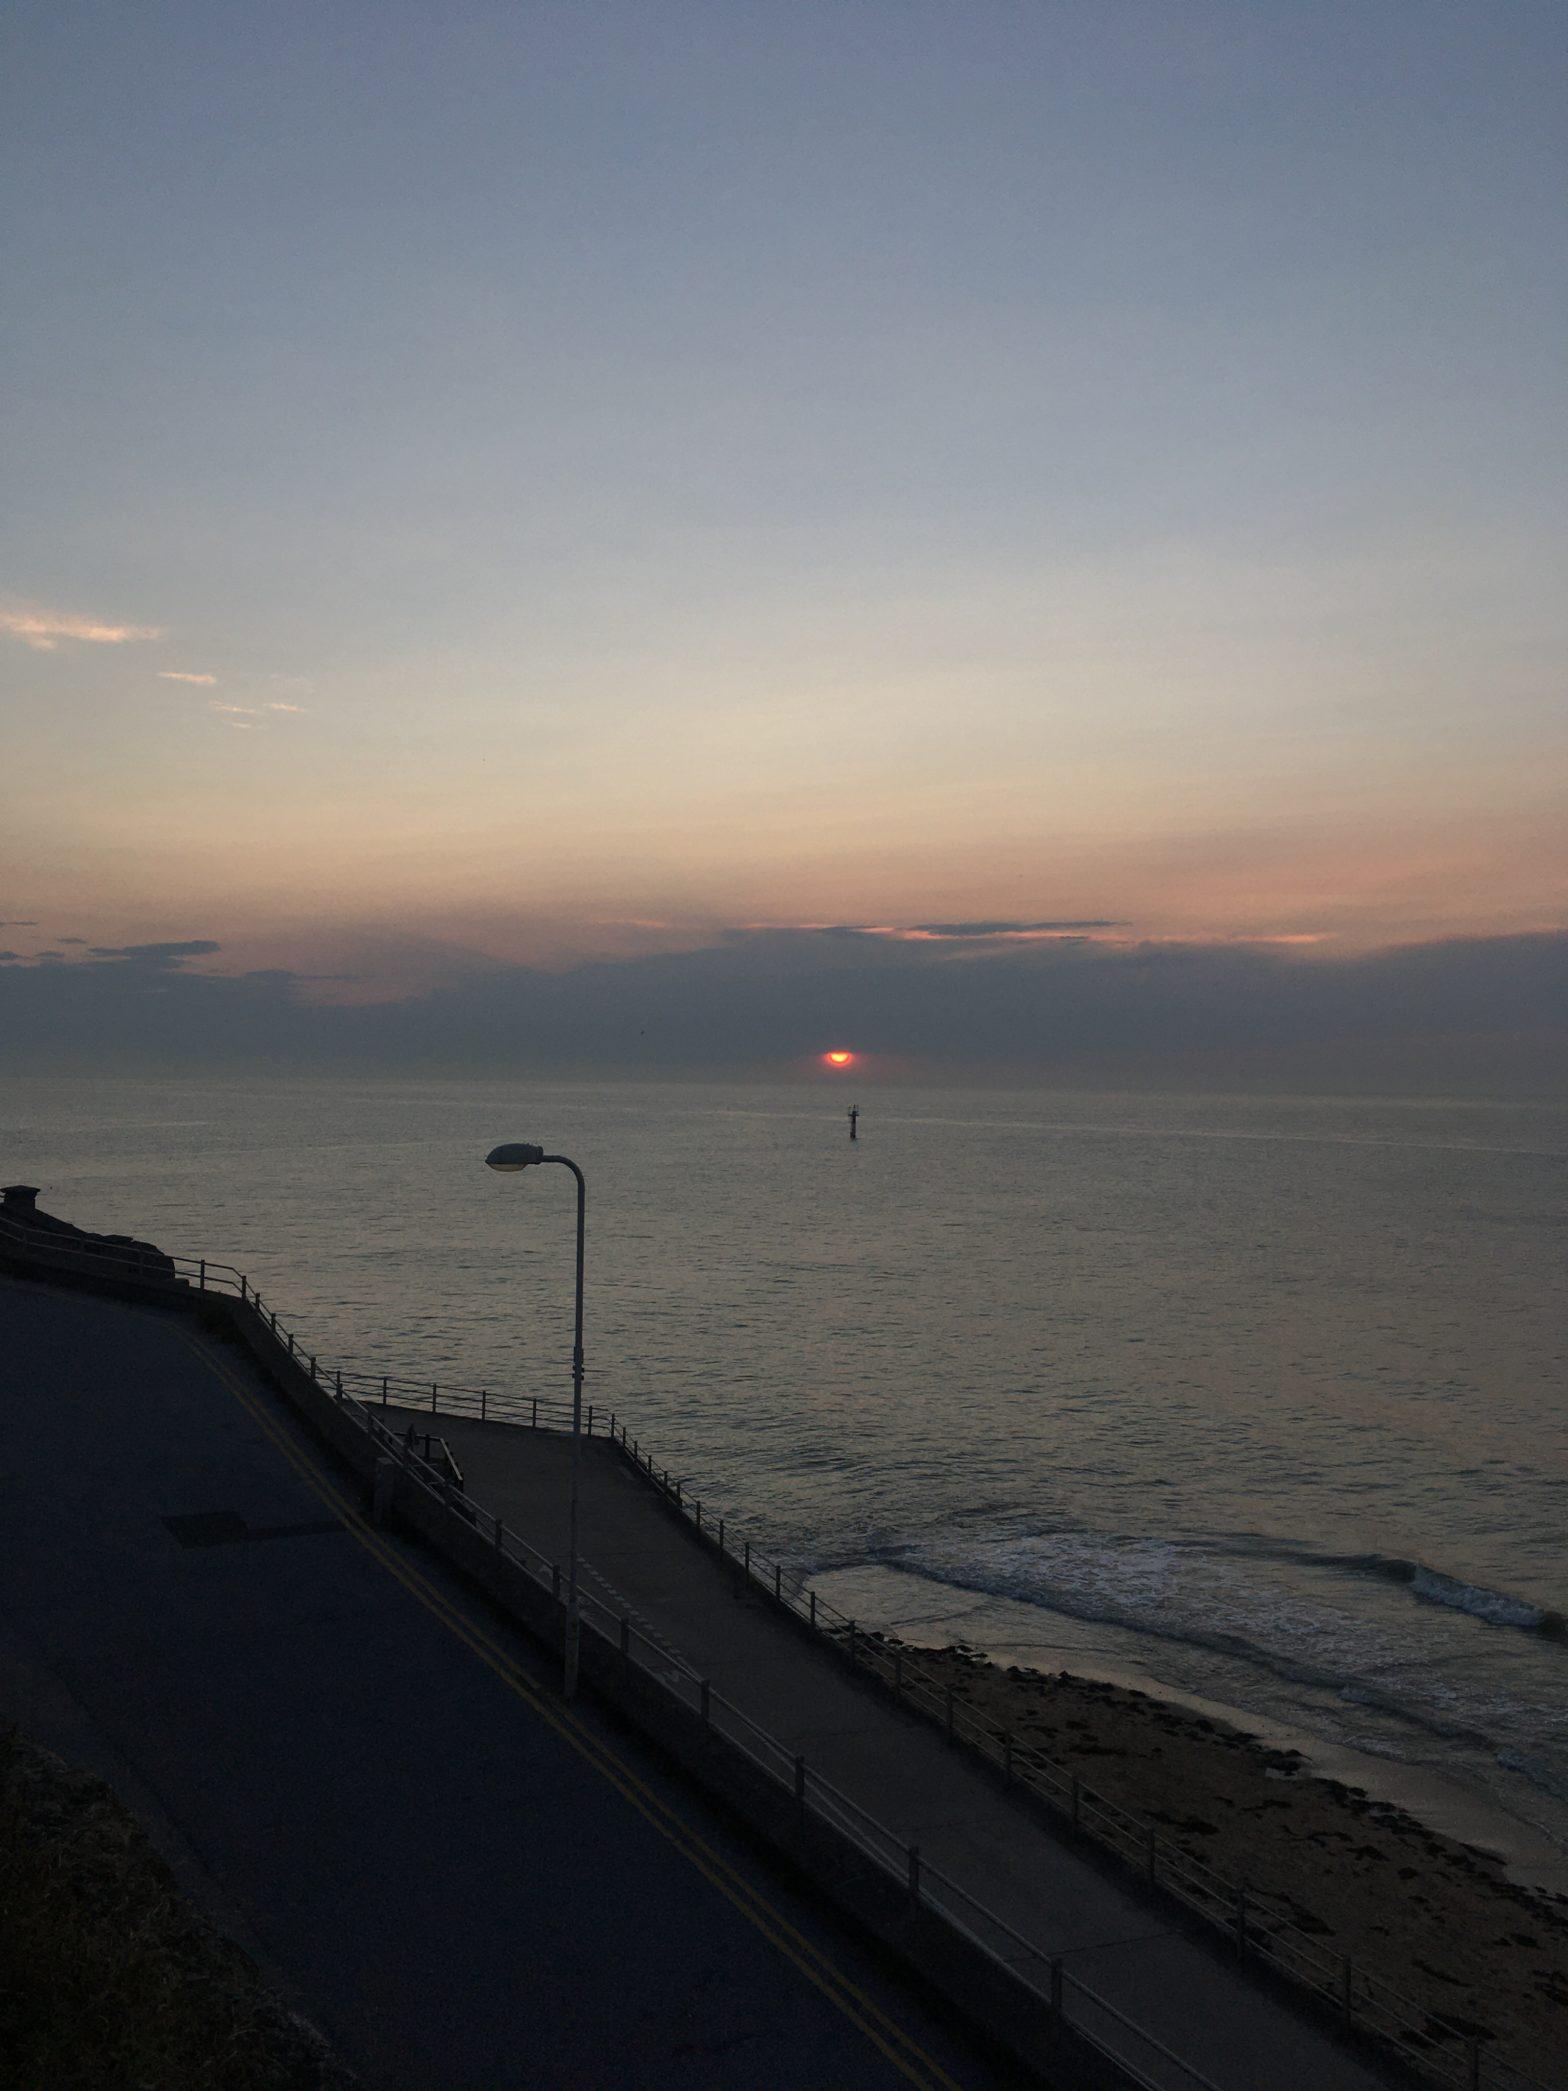 The coast in Margate